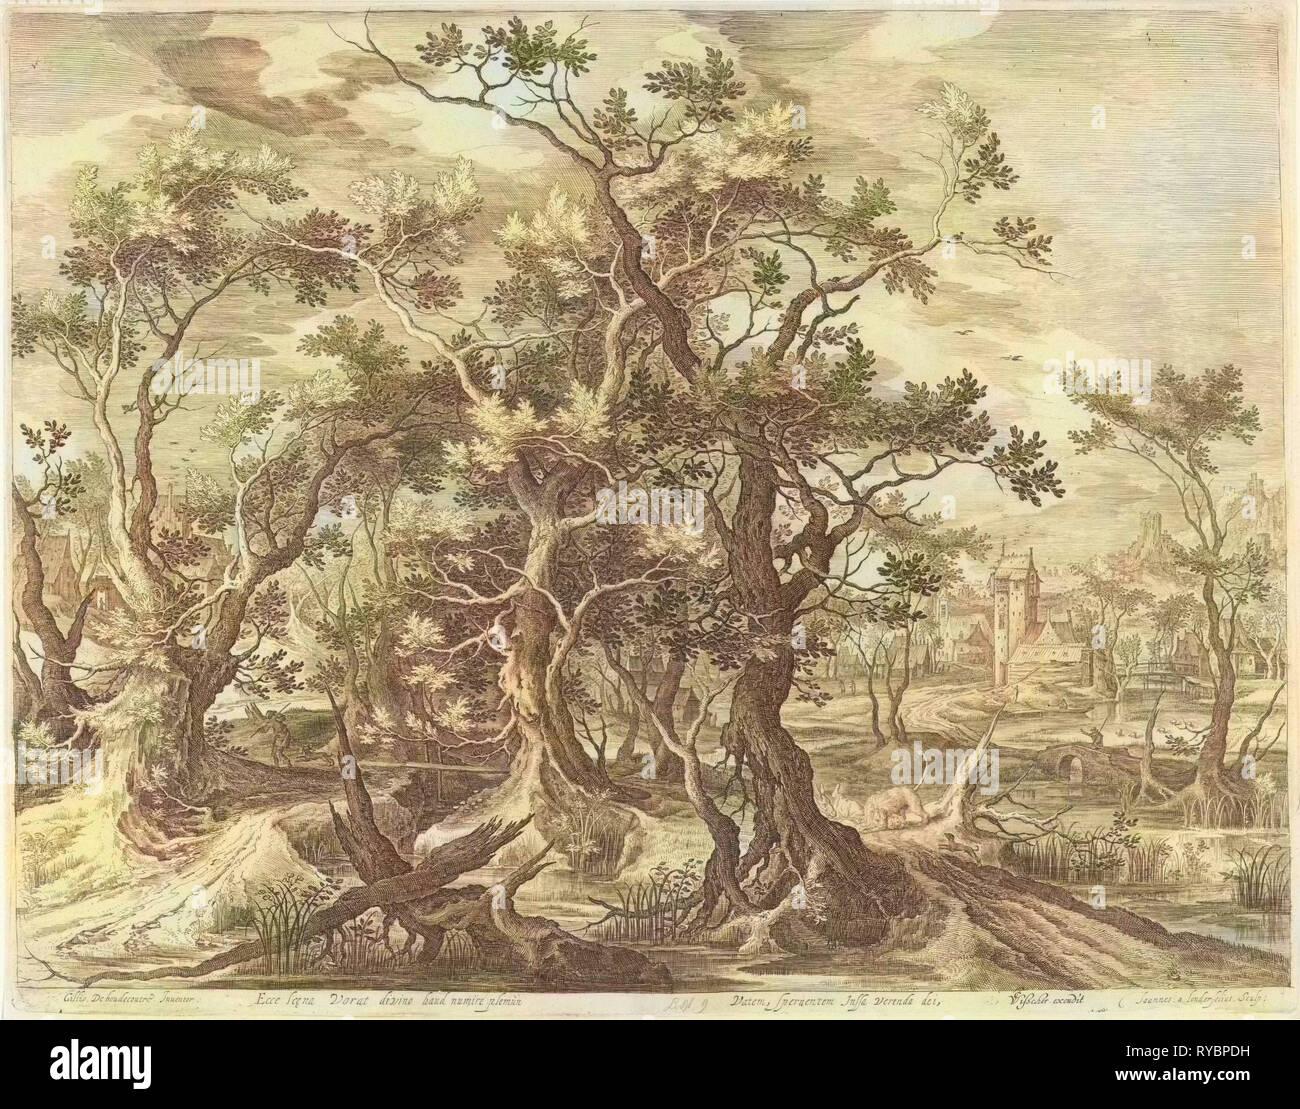 Landscape with a prophet torn by a lion from Judah, print maker: Jan van Londerseel, Gillis Claesz. de Hondecoeter, Claes Jansz. Visscher II, 1601 - 1652 - Stock Image